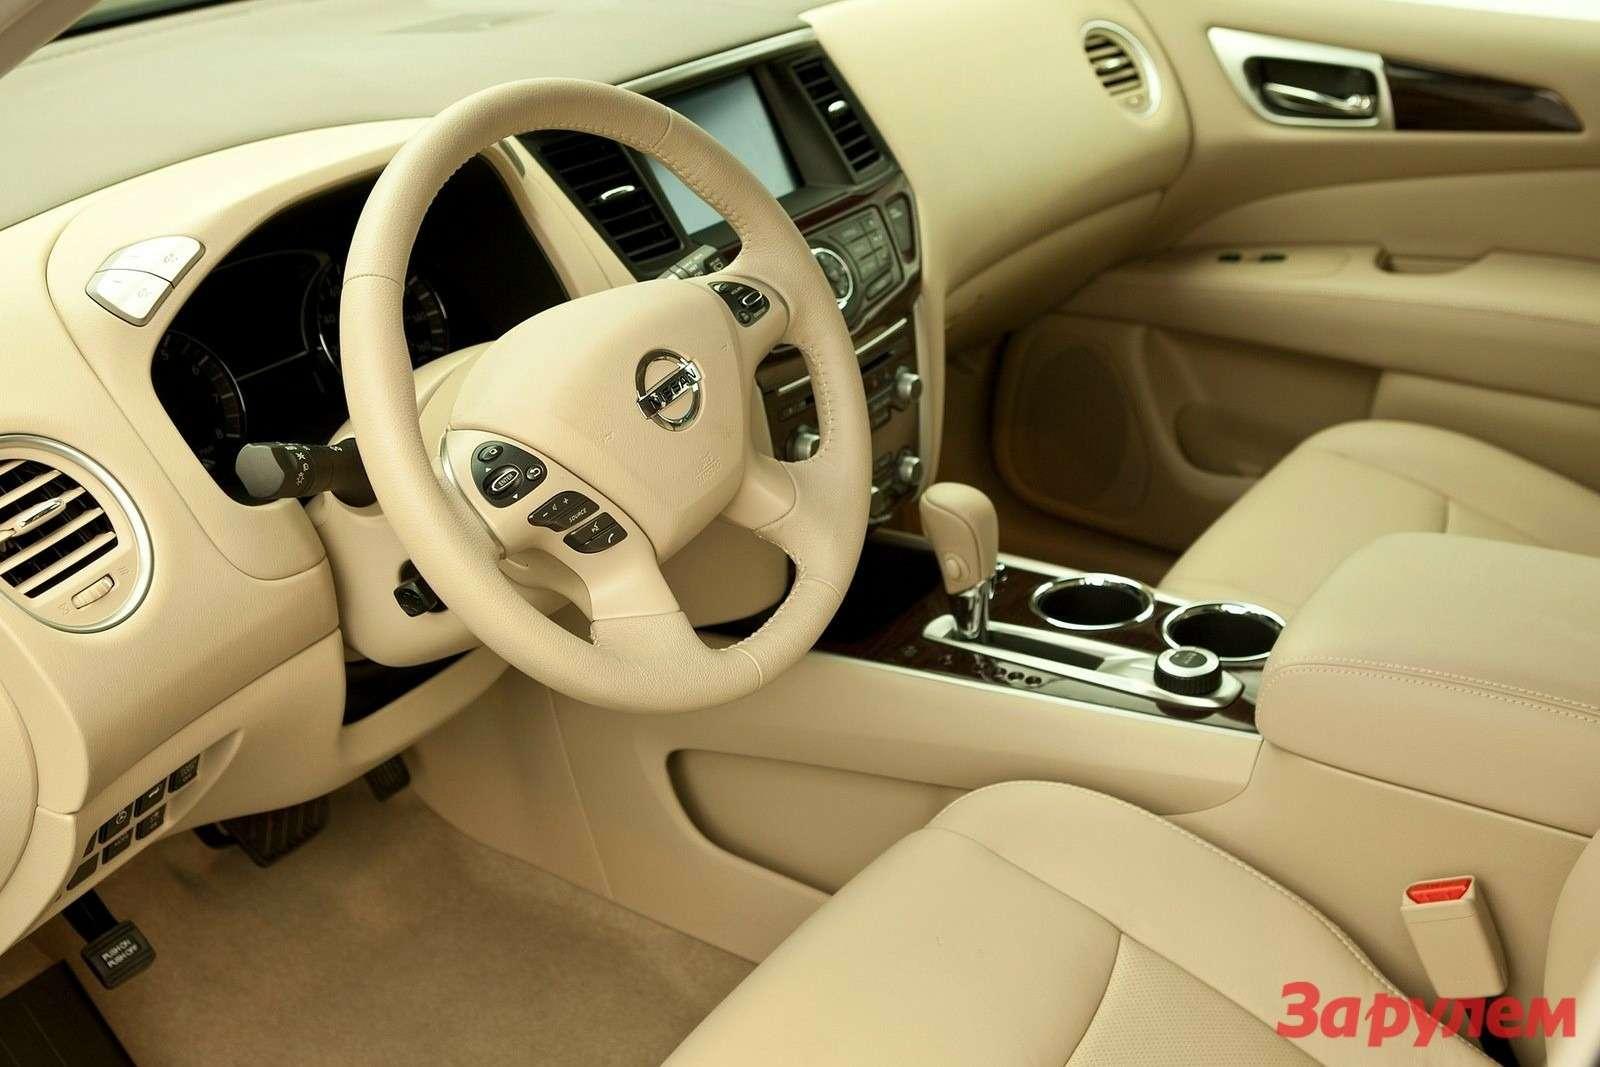 Nissan Pathfinder Hybrid 2014 1600x1200 wallpaper 0c